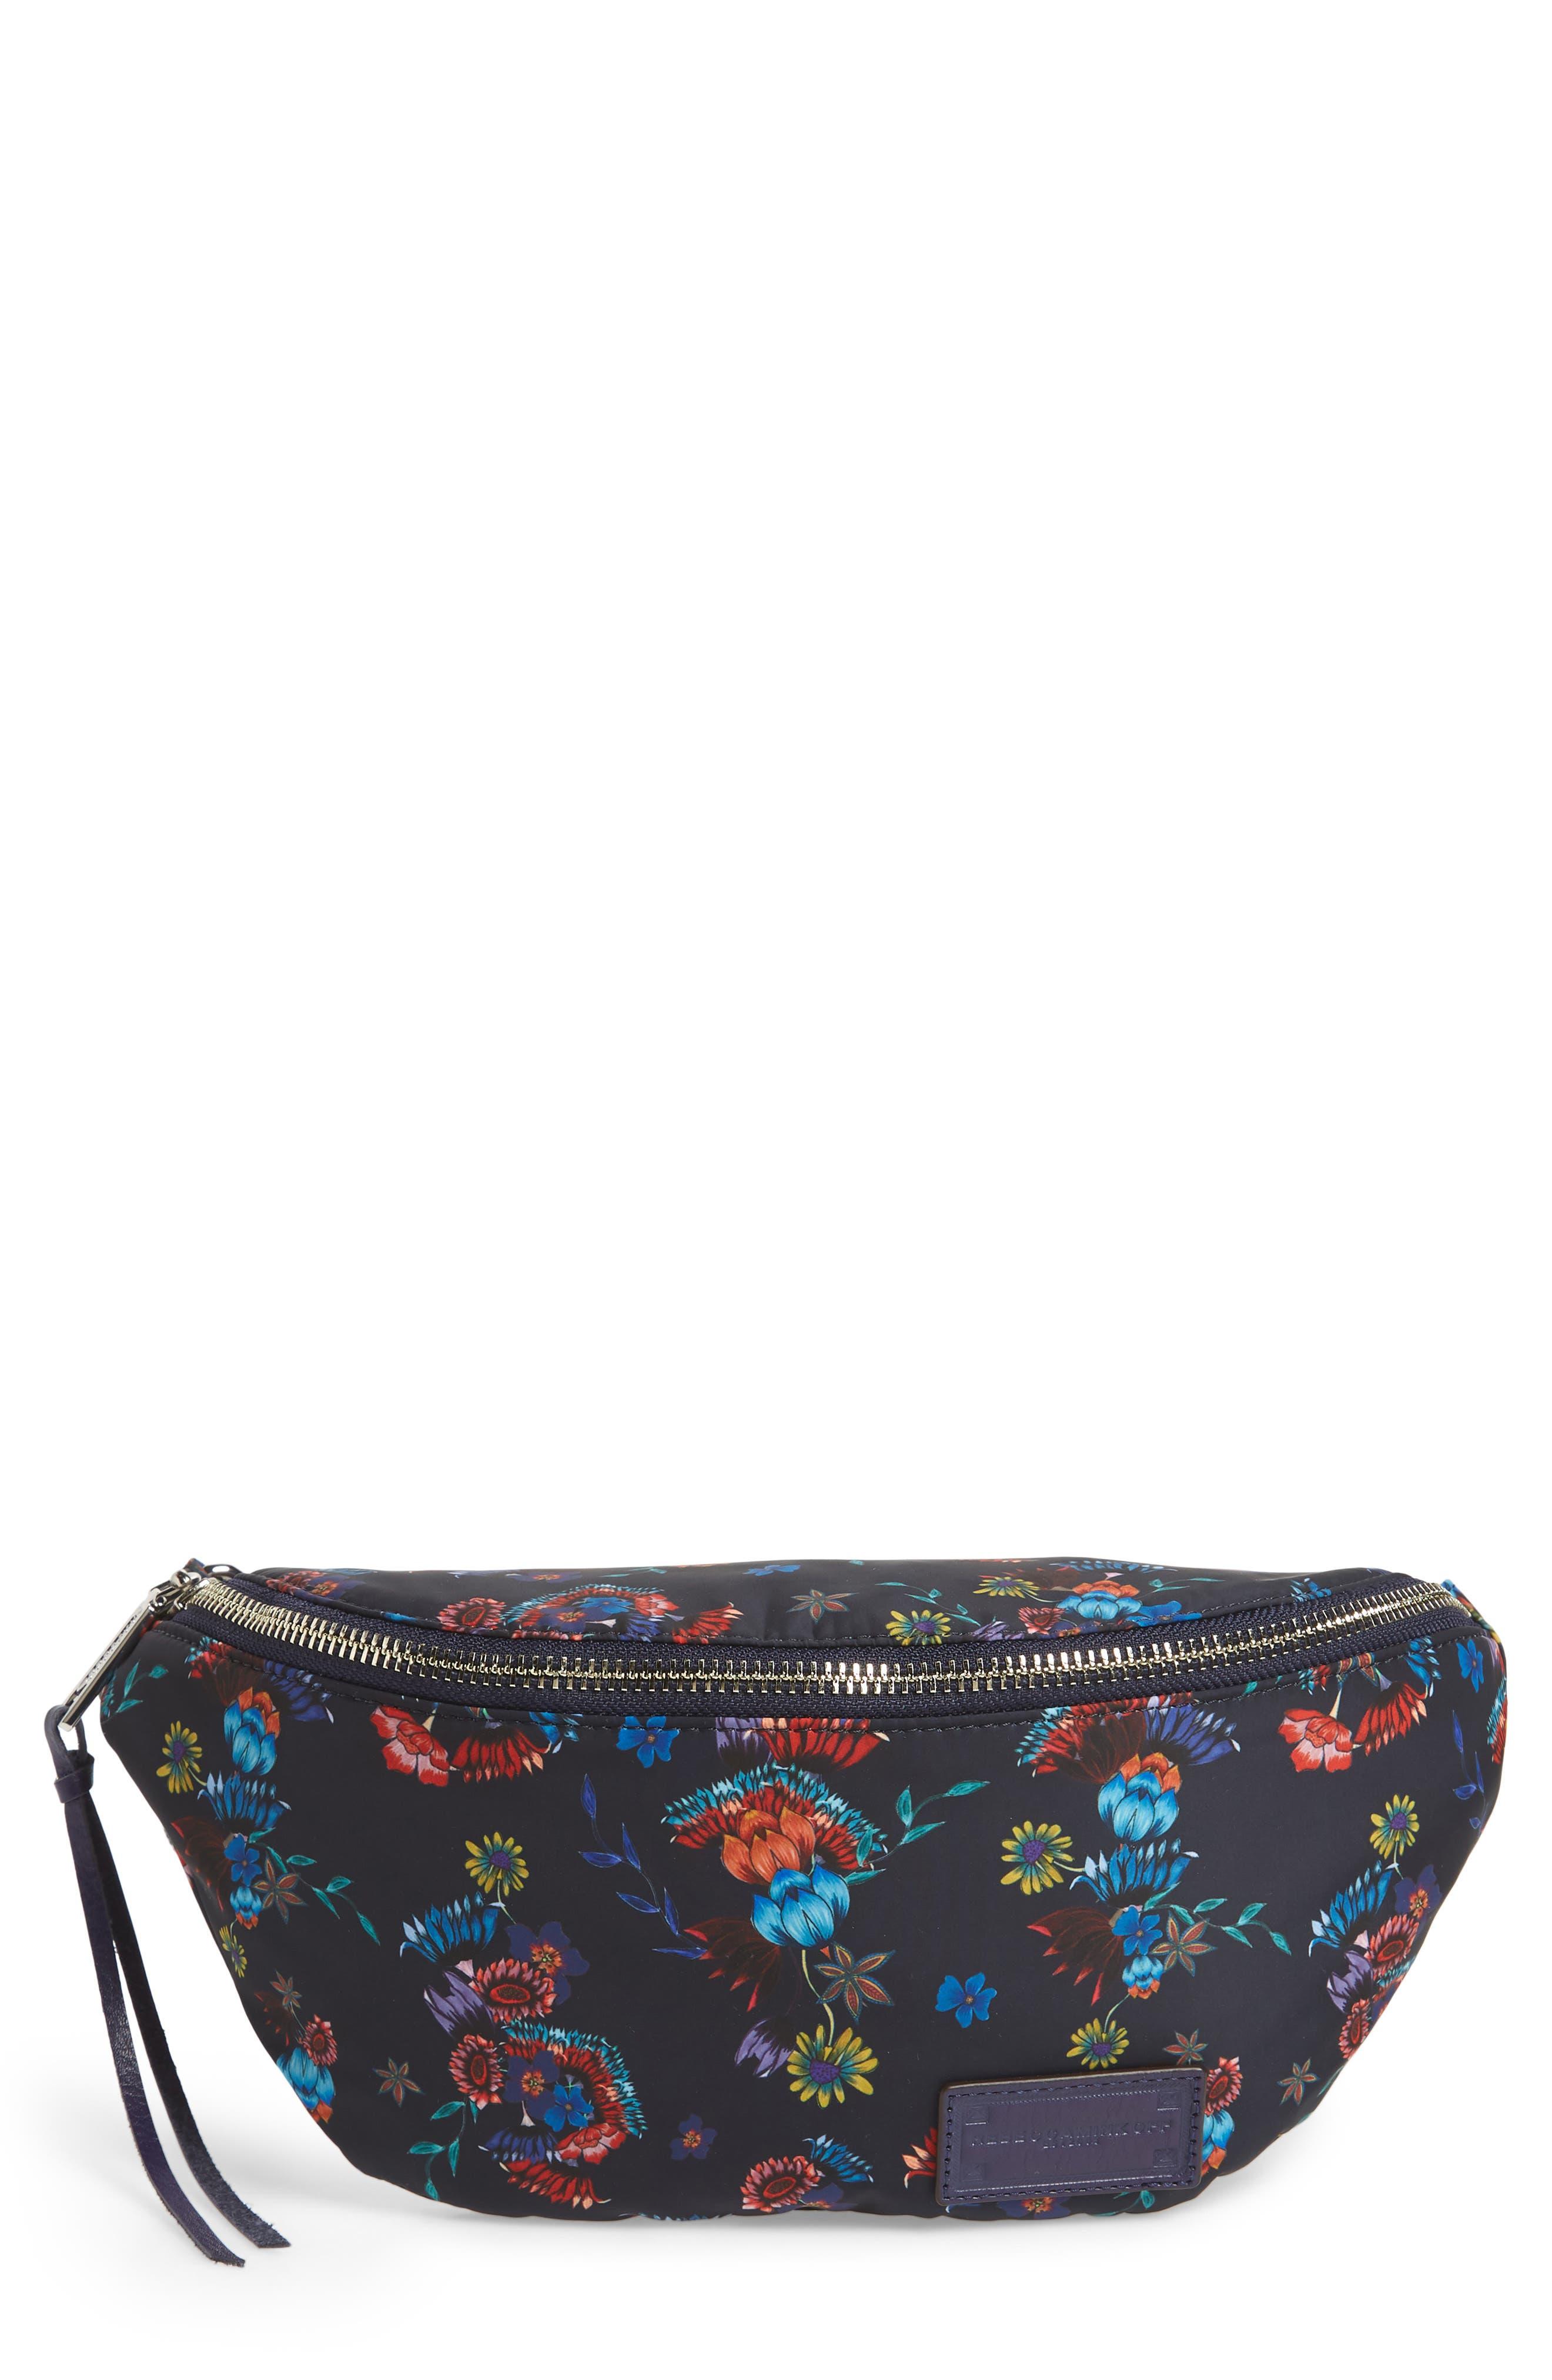 Alternate Image 1 Selected - Rebecca Minkoff Nylon Belt Bag